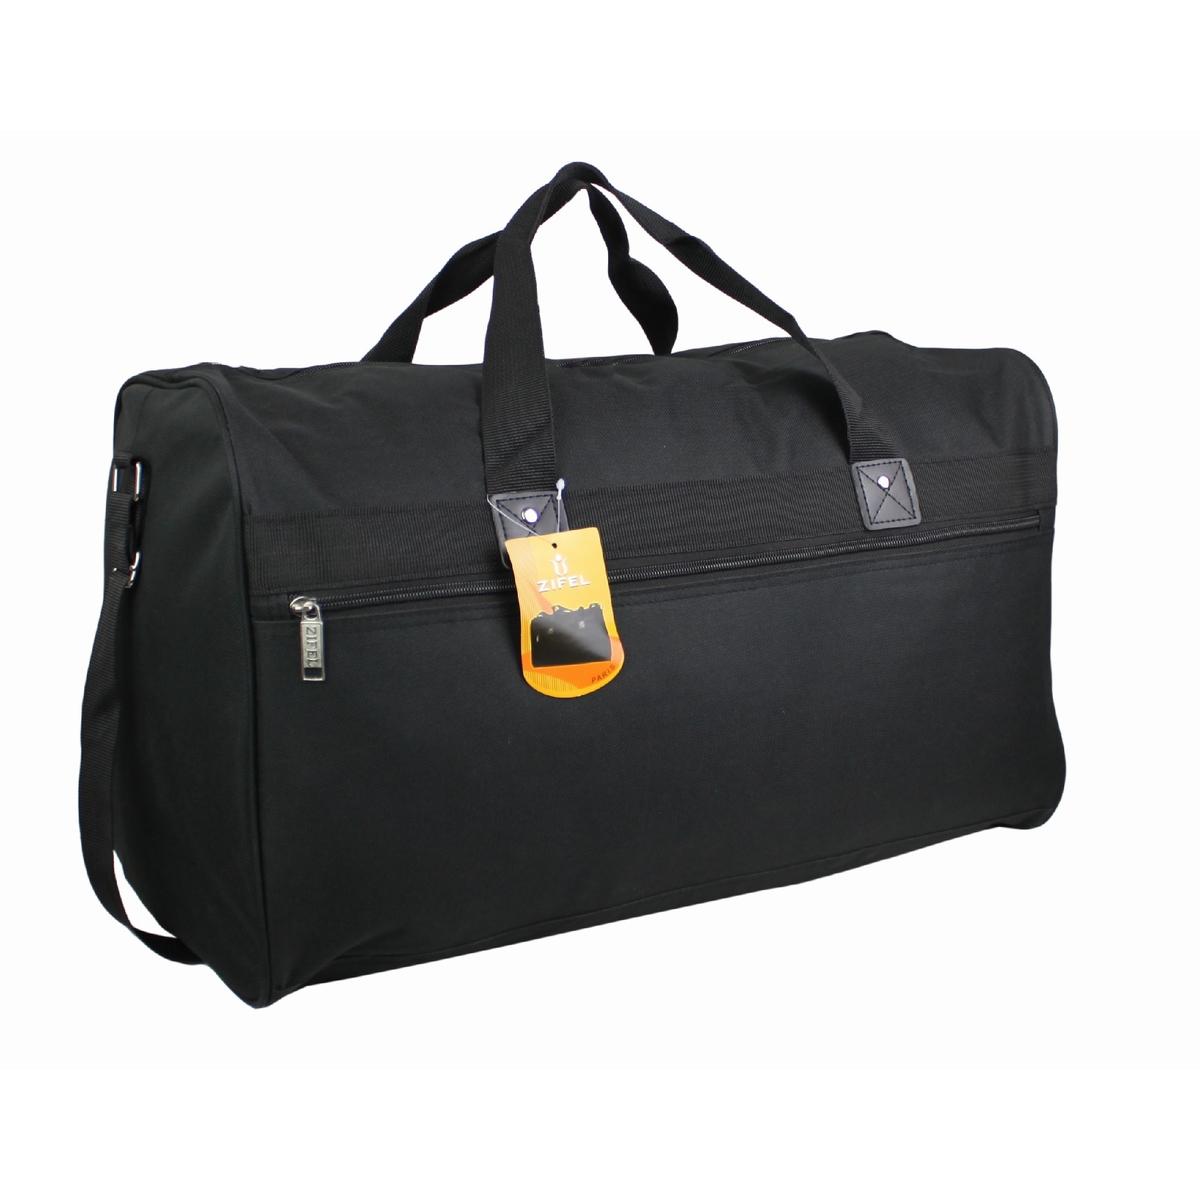 sac de voyage pas cher myvalise achat bagage. Black Bedroom Furniture Sets. Home Design Ideas